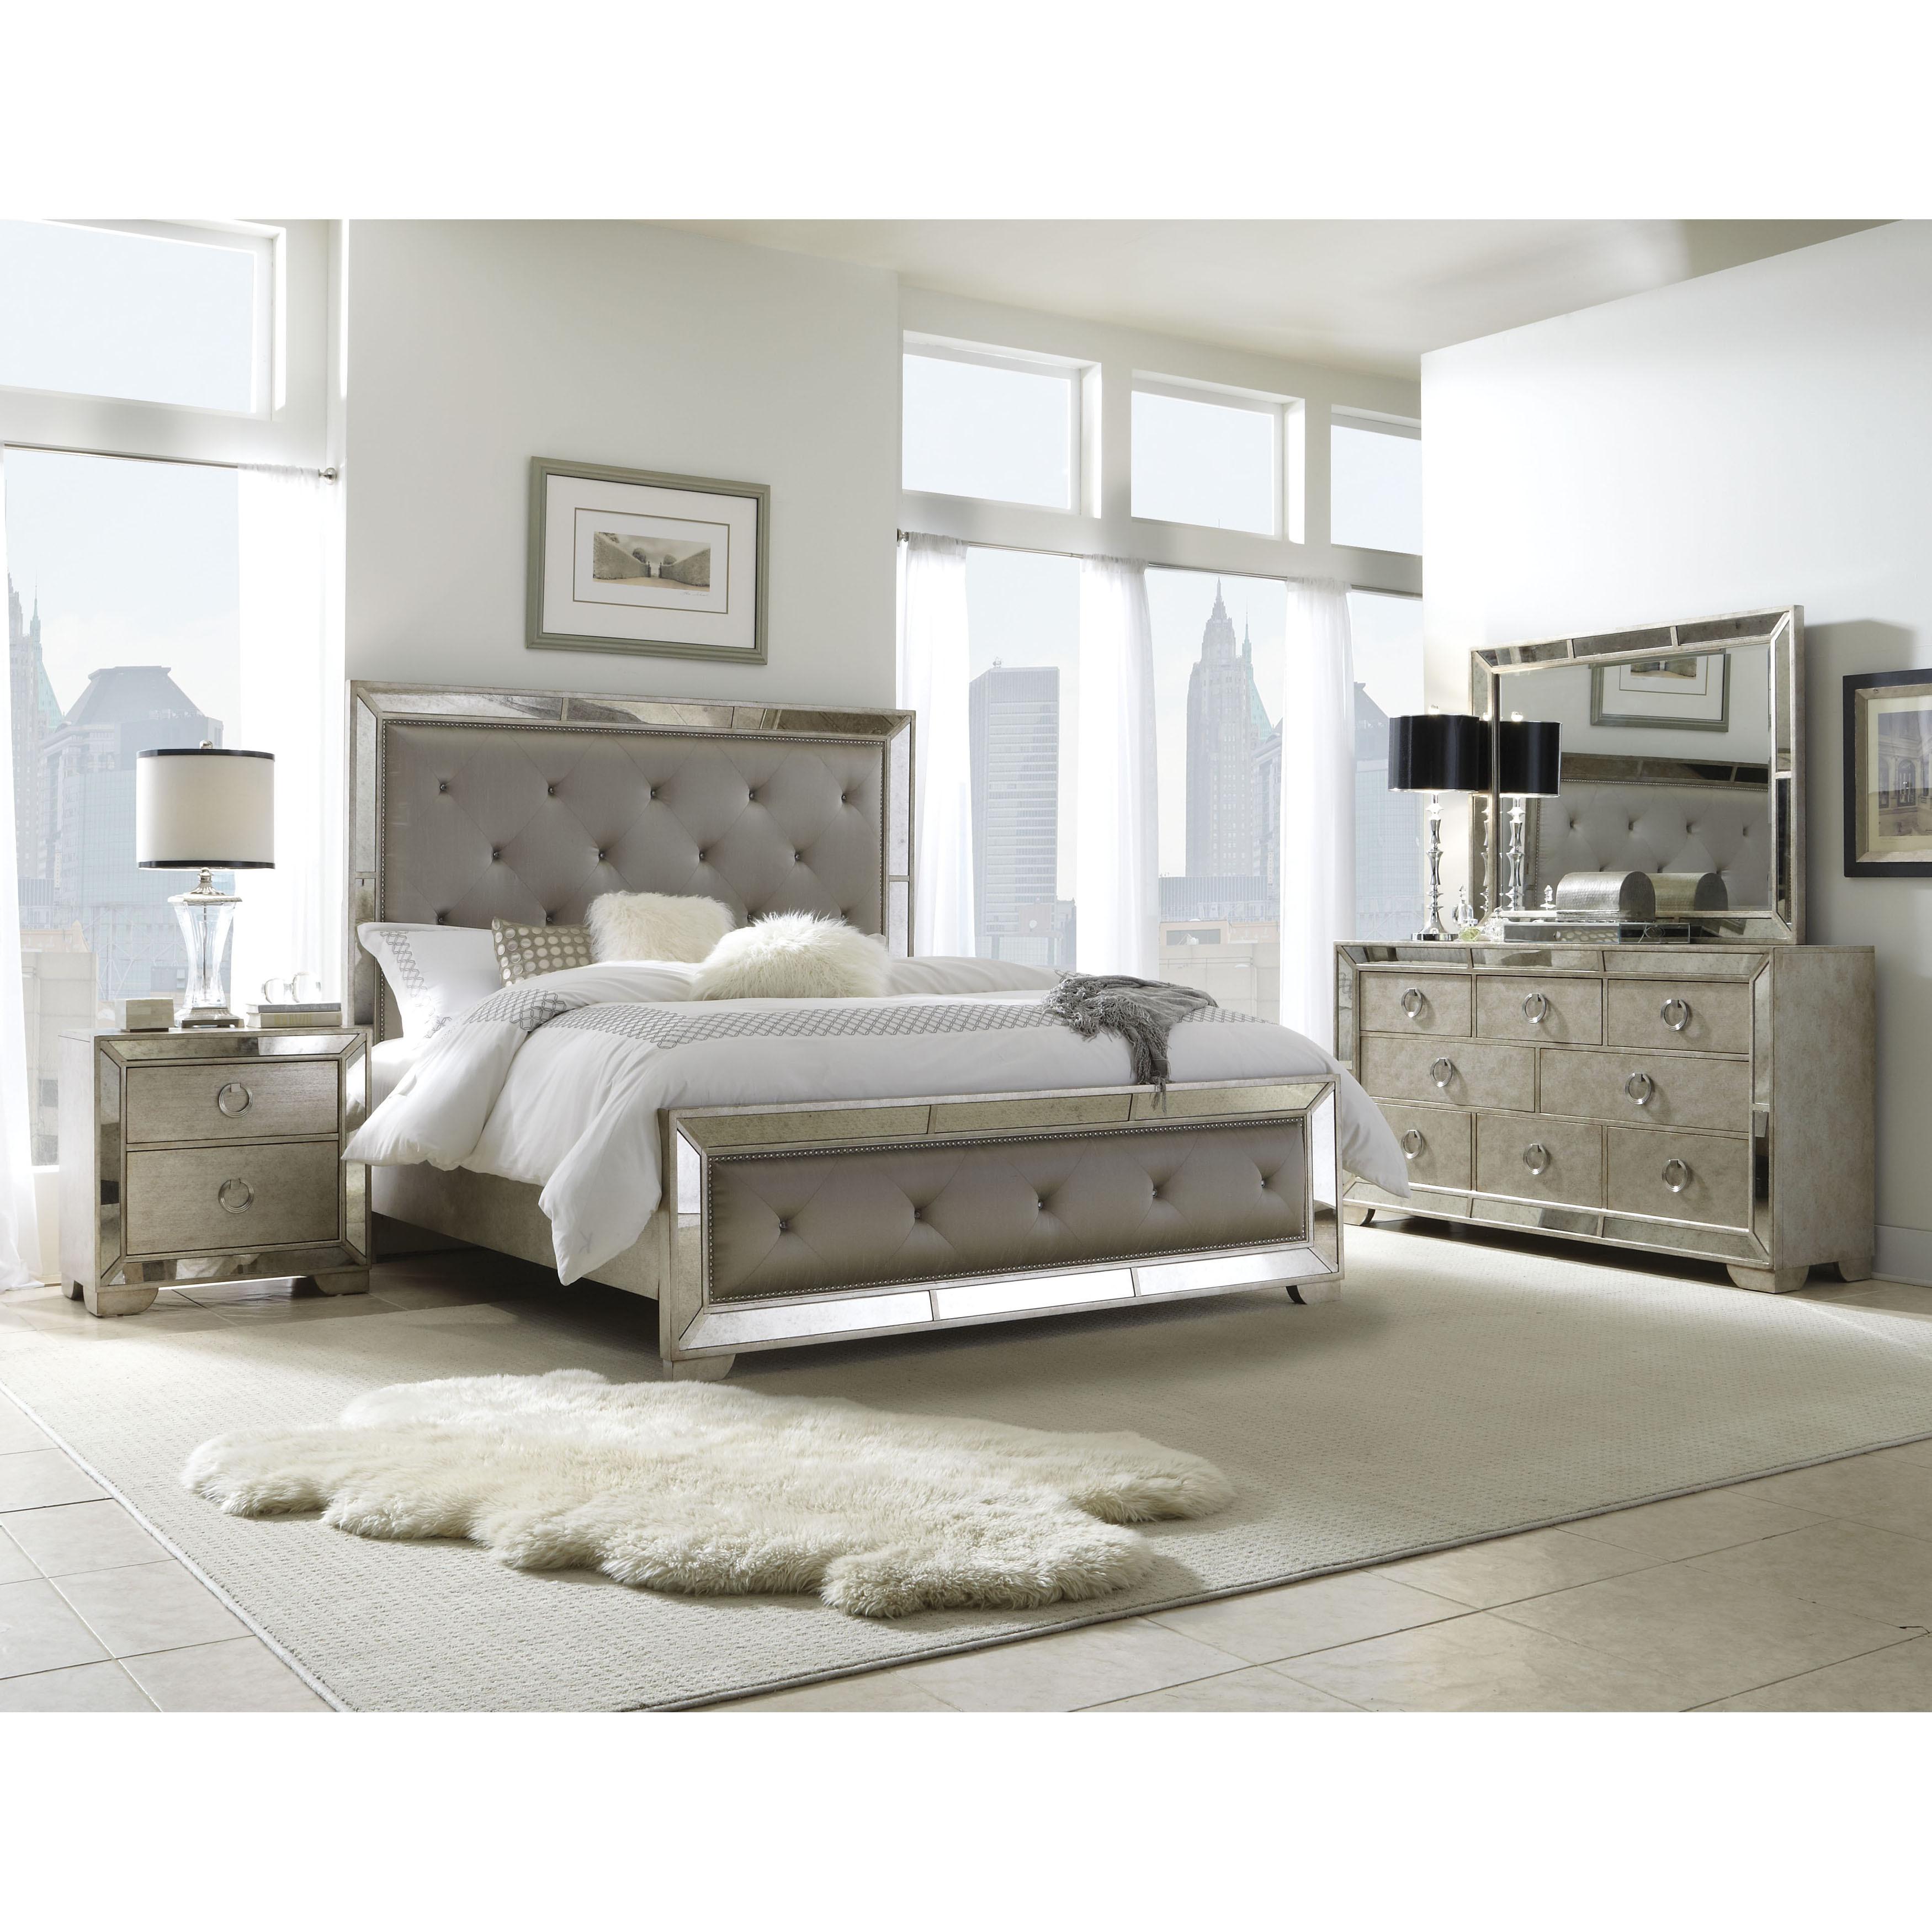 mirrored furniture bedroom designs photo - 6